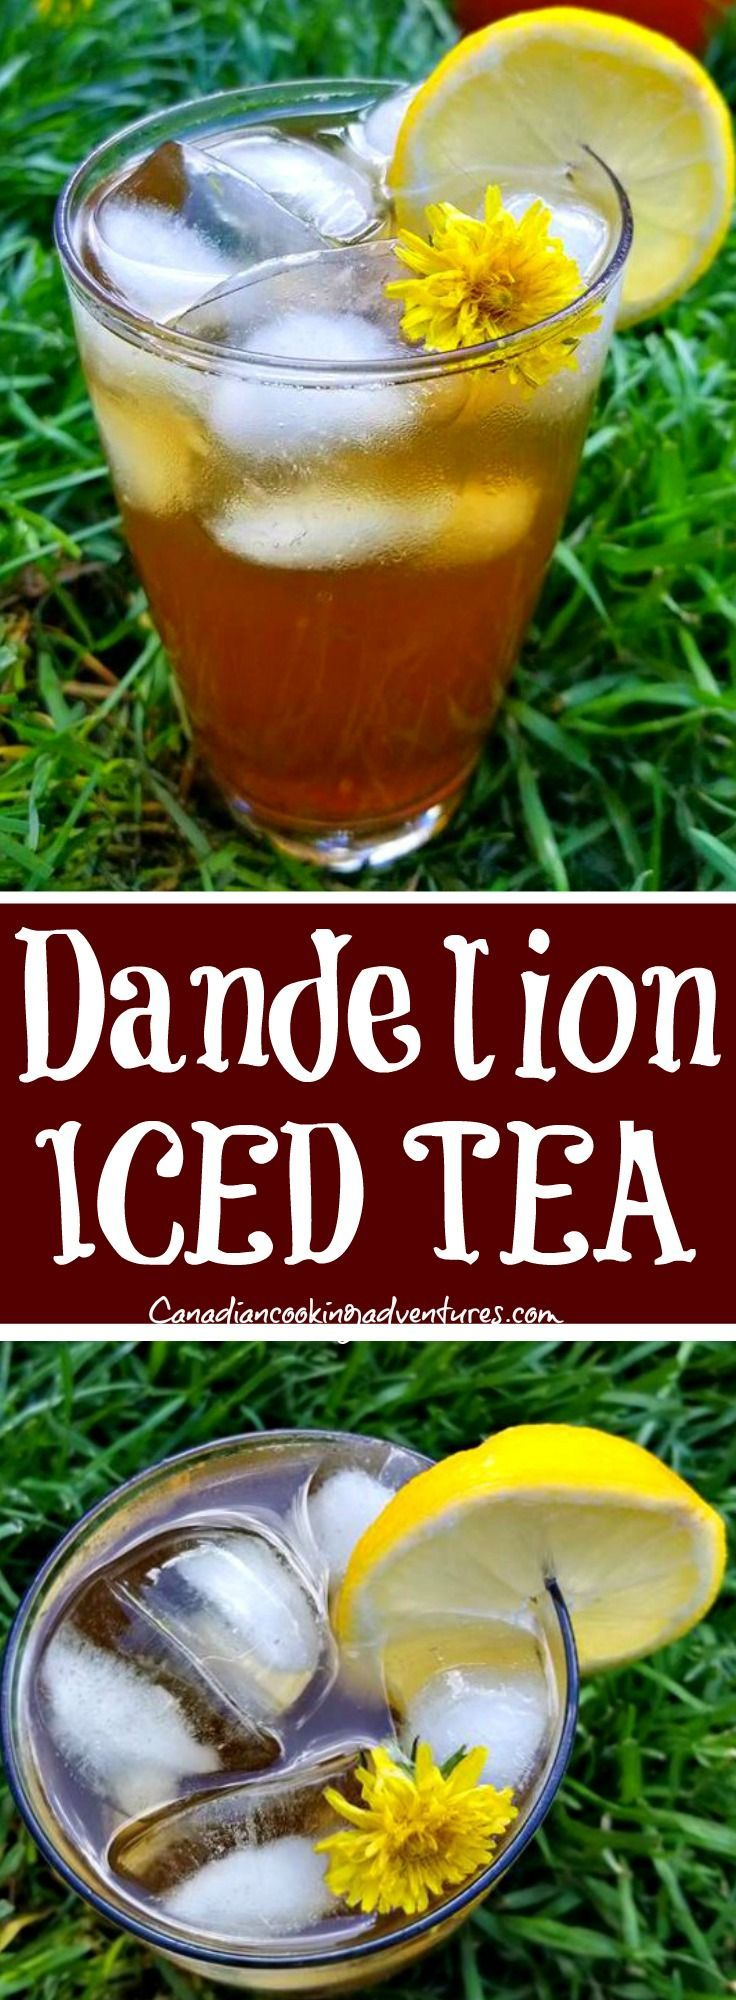 Dandelion Iced Tea Dandelion Iced Tea is the new Super Beverage